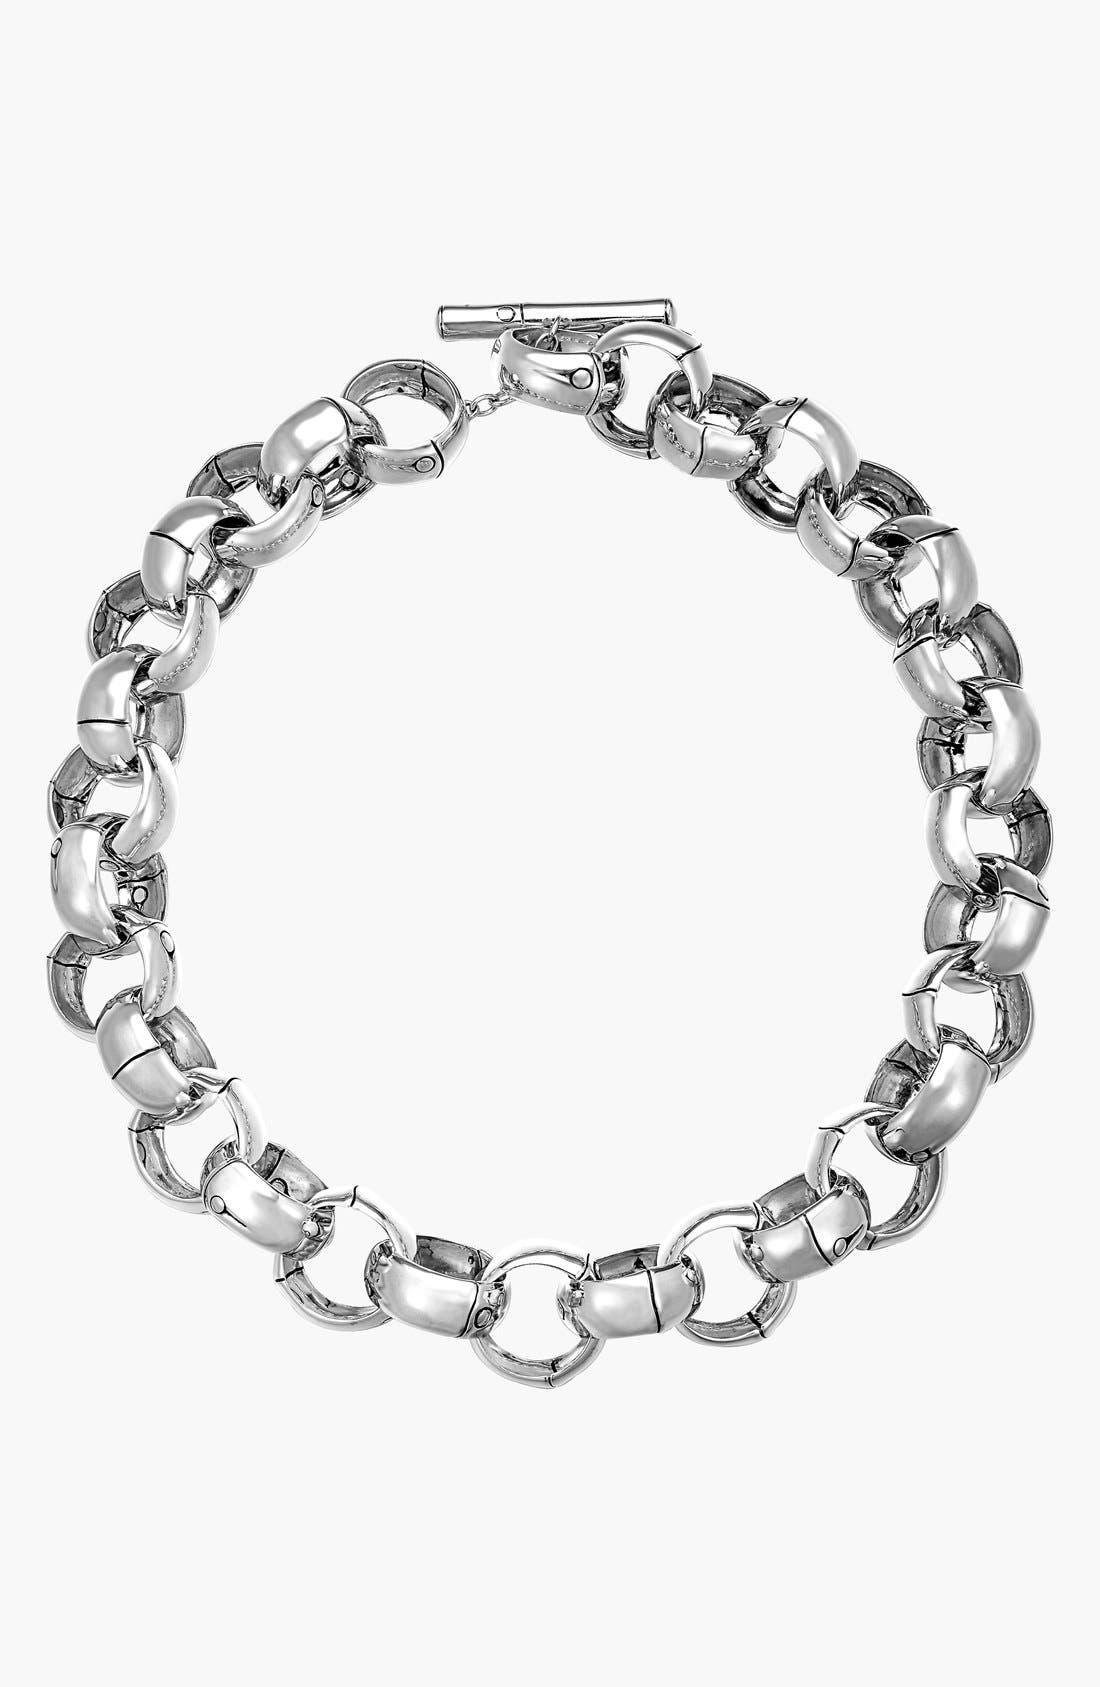 Alternate Image 1 Selected - John Hardy 'Bamboo' Link Necklace